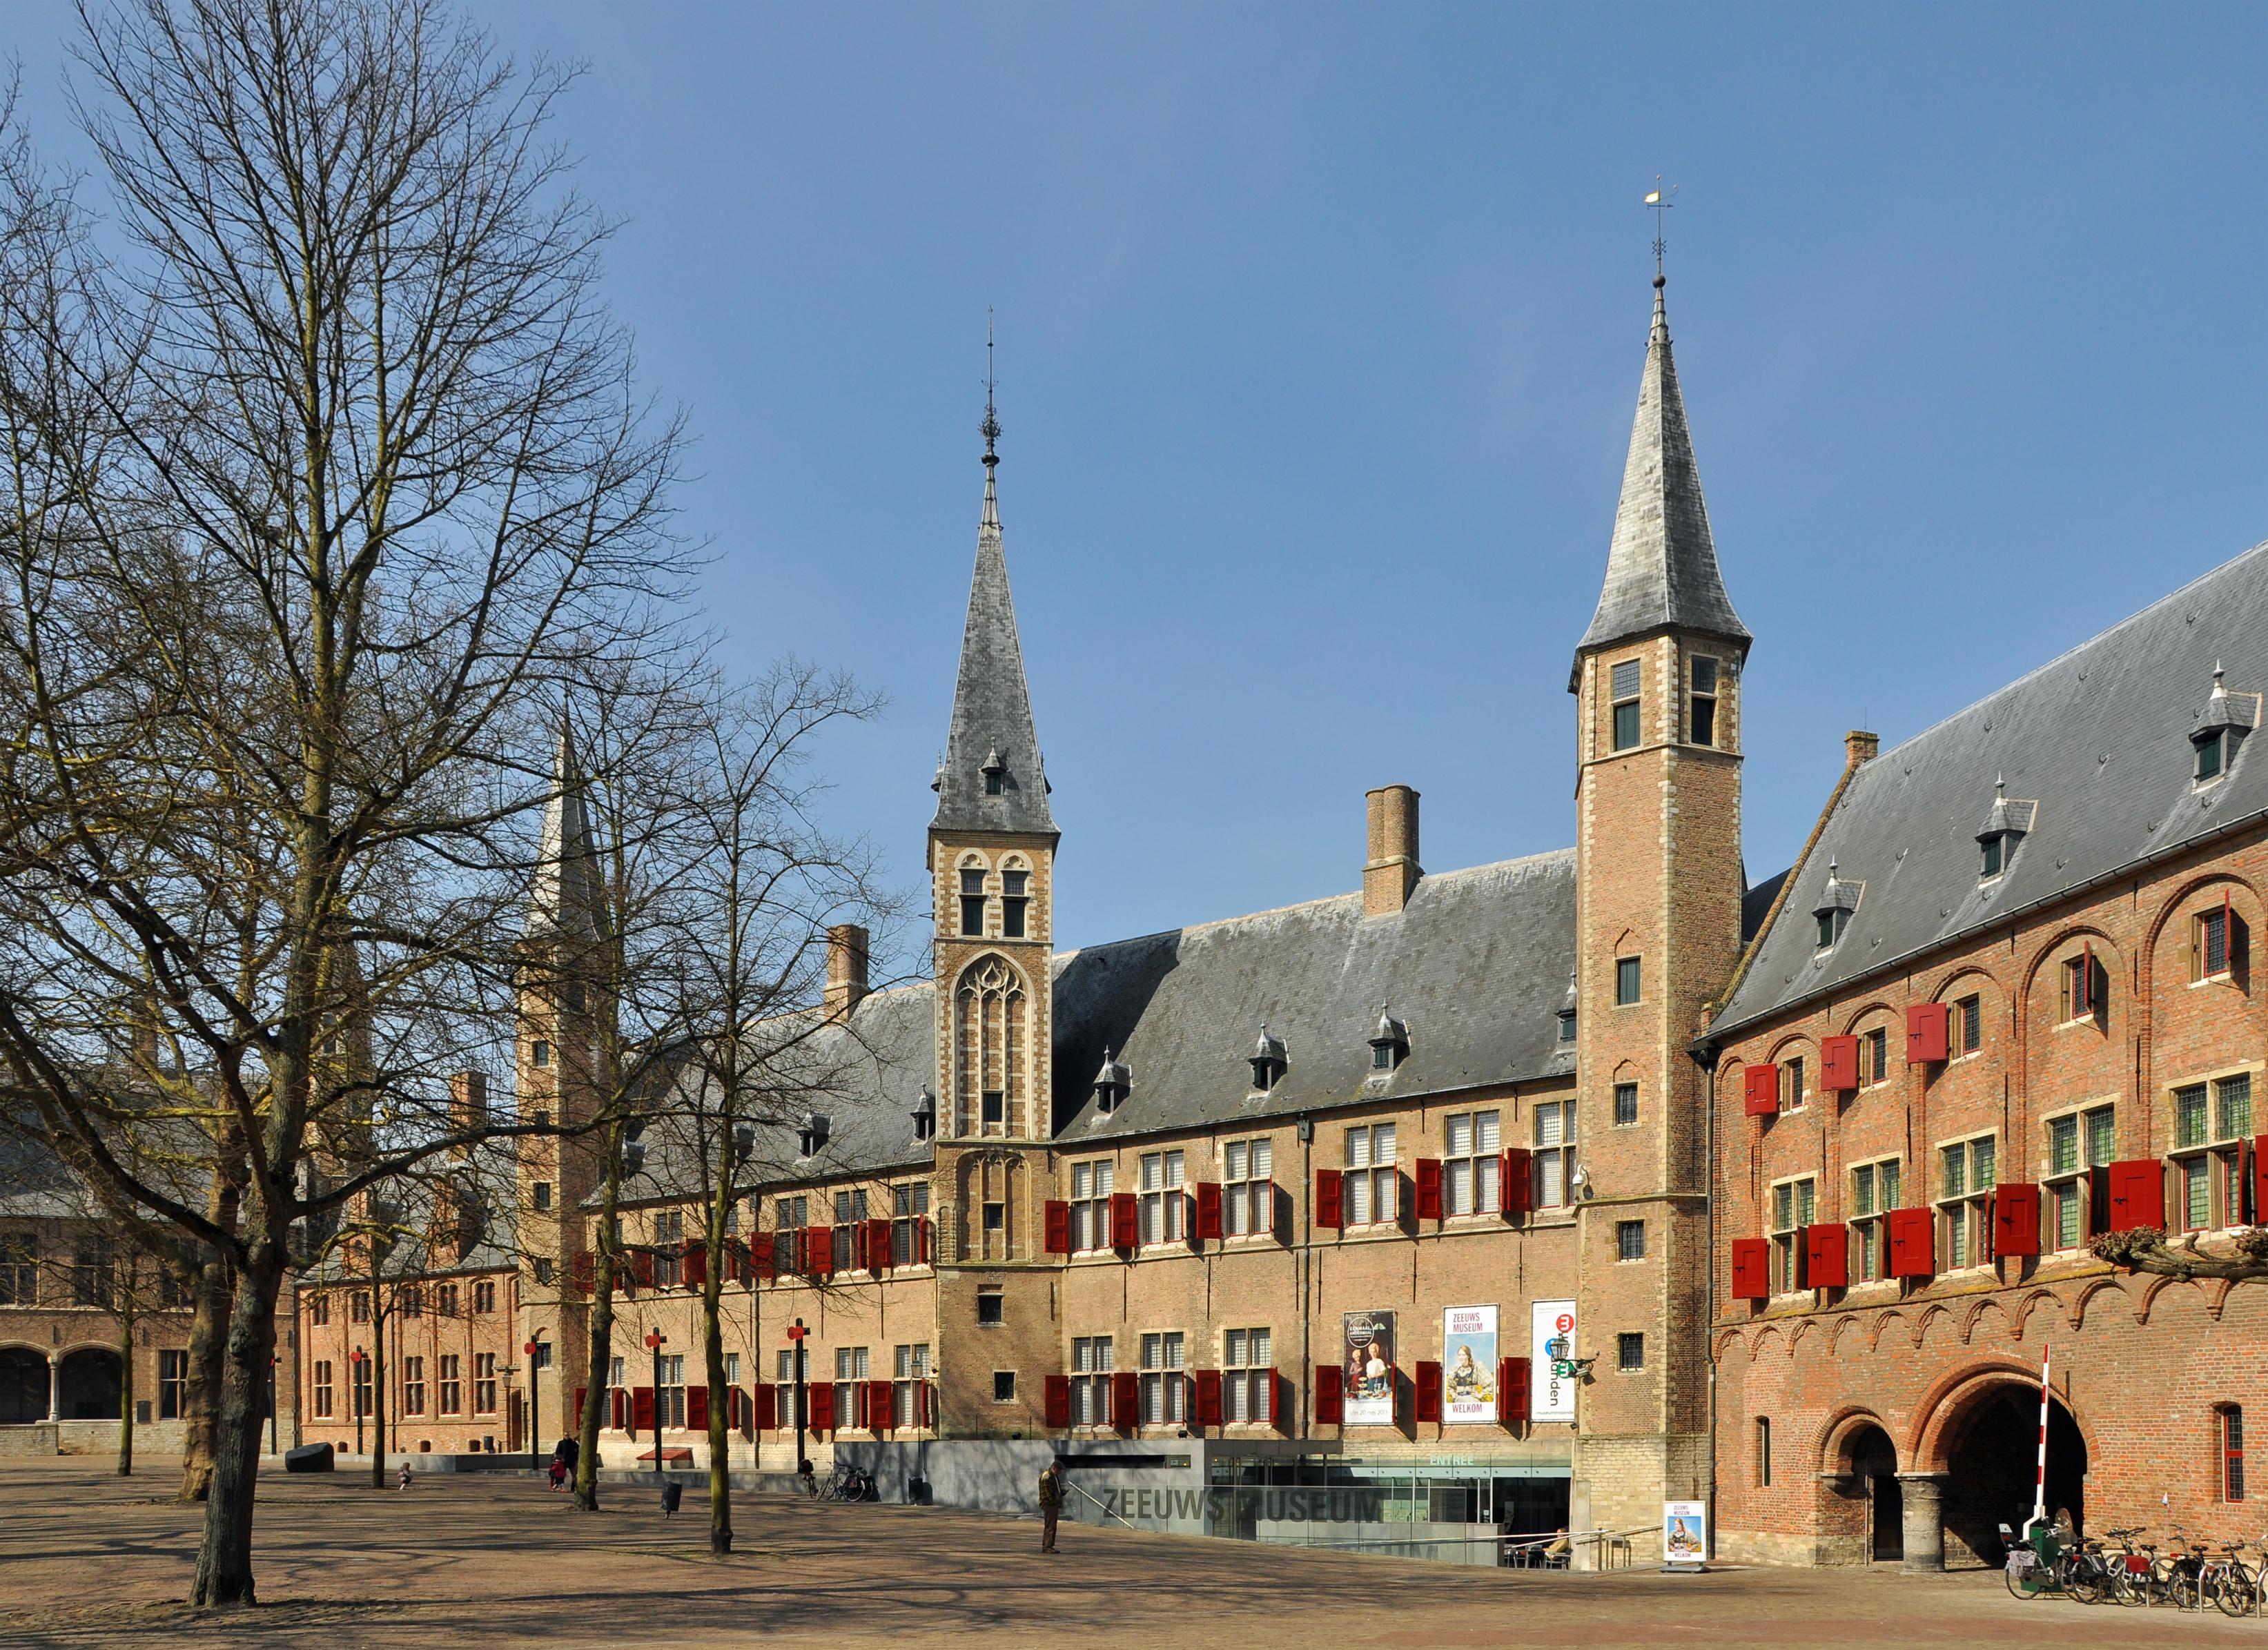 Abbazia di Middelburg NL Abdij van Middelburg